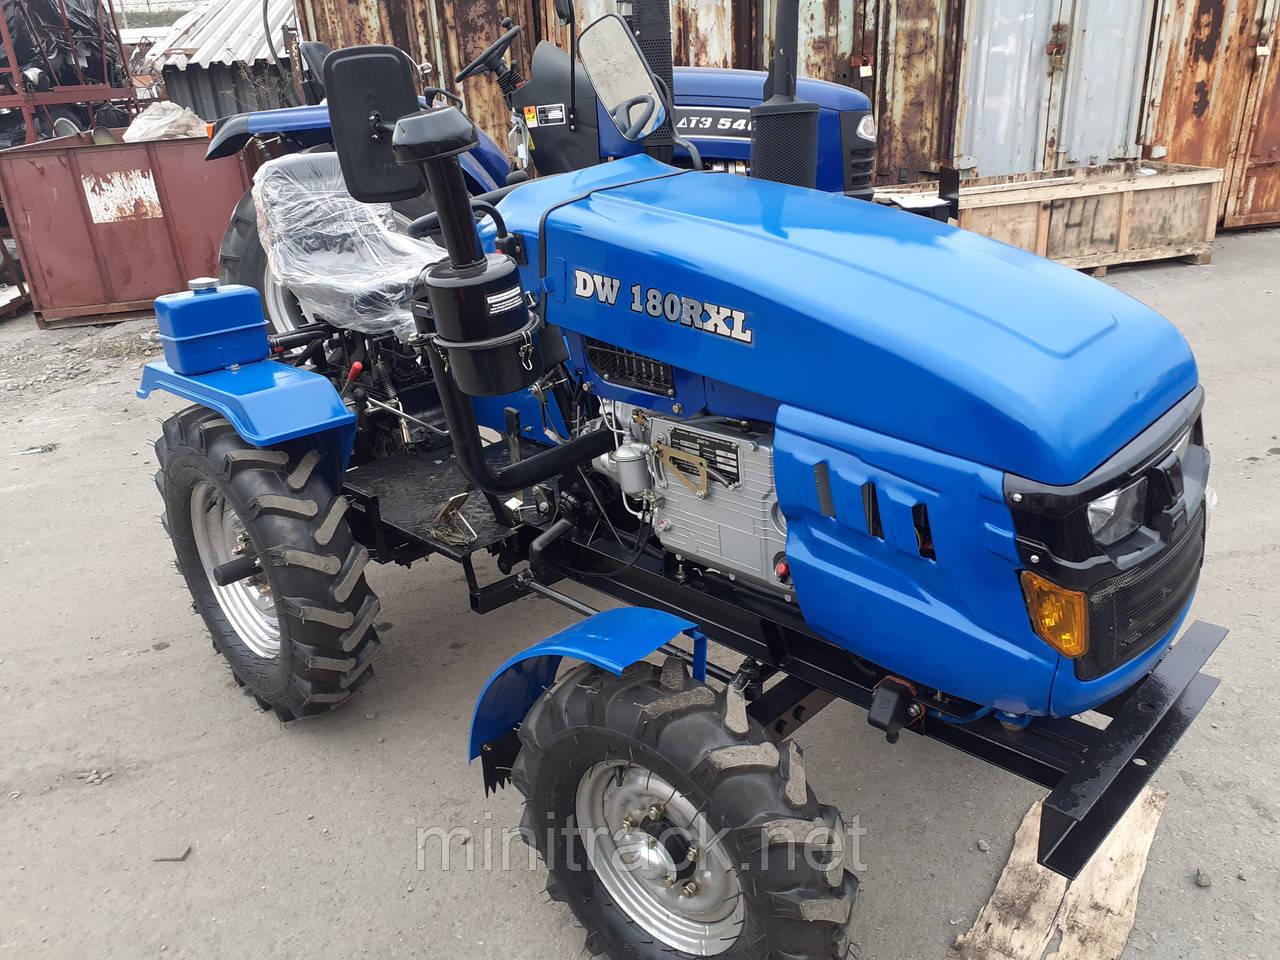 Мототрактор DW-180RXL BLUE